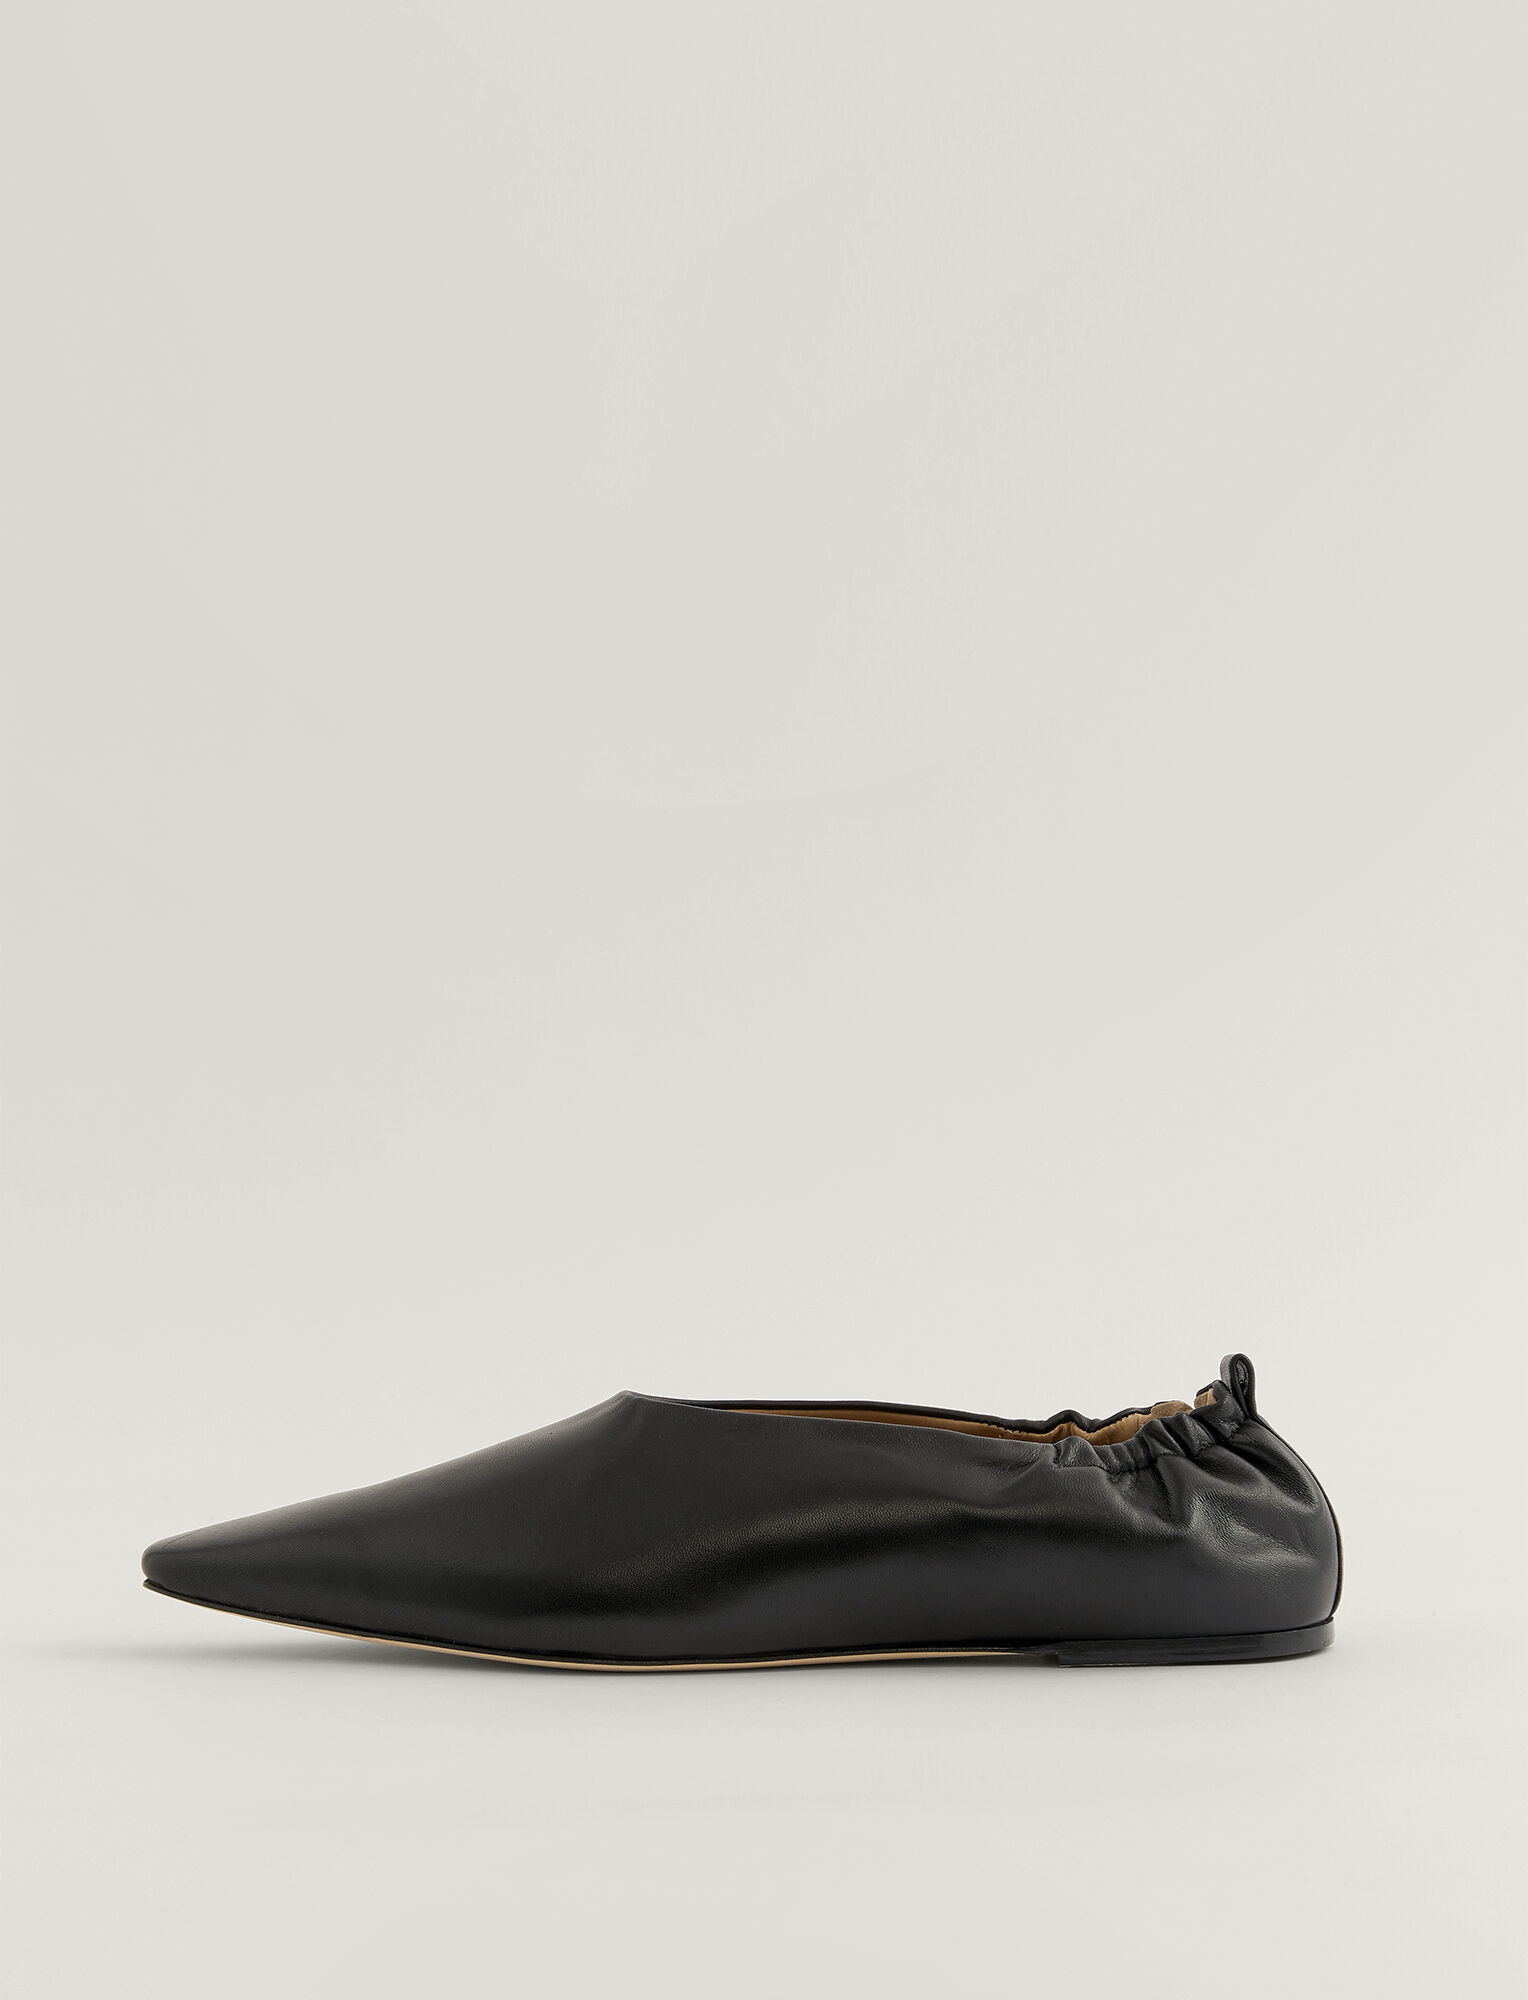 Joseph, Pointy Square Ballerina Shoes, in BLACK